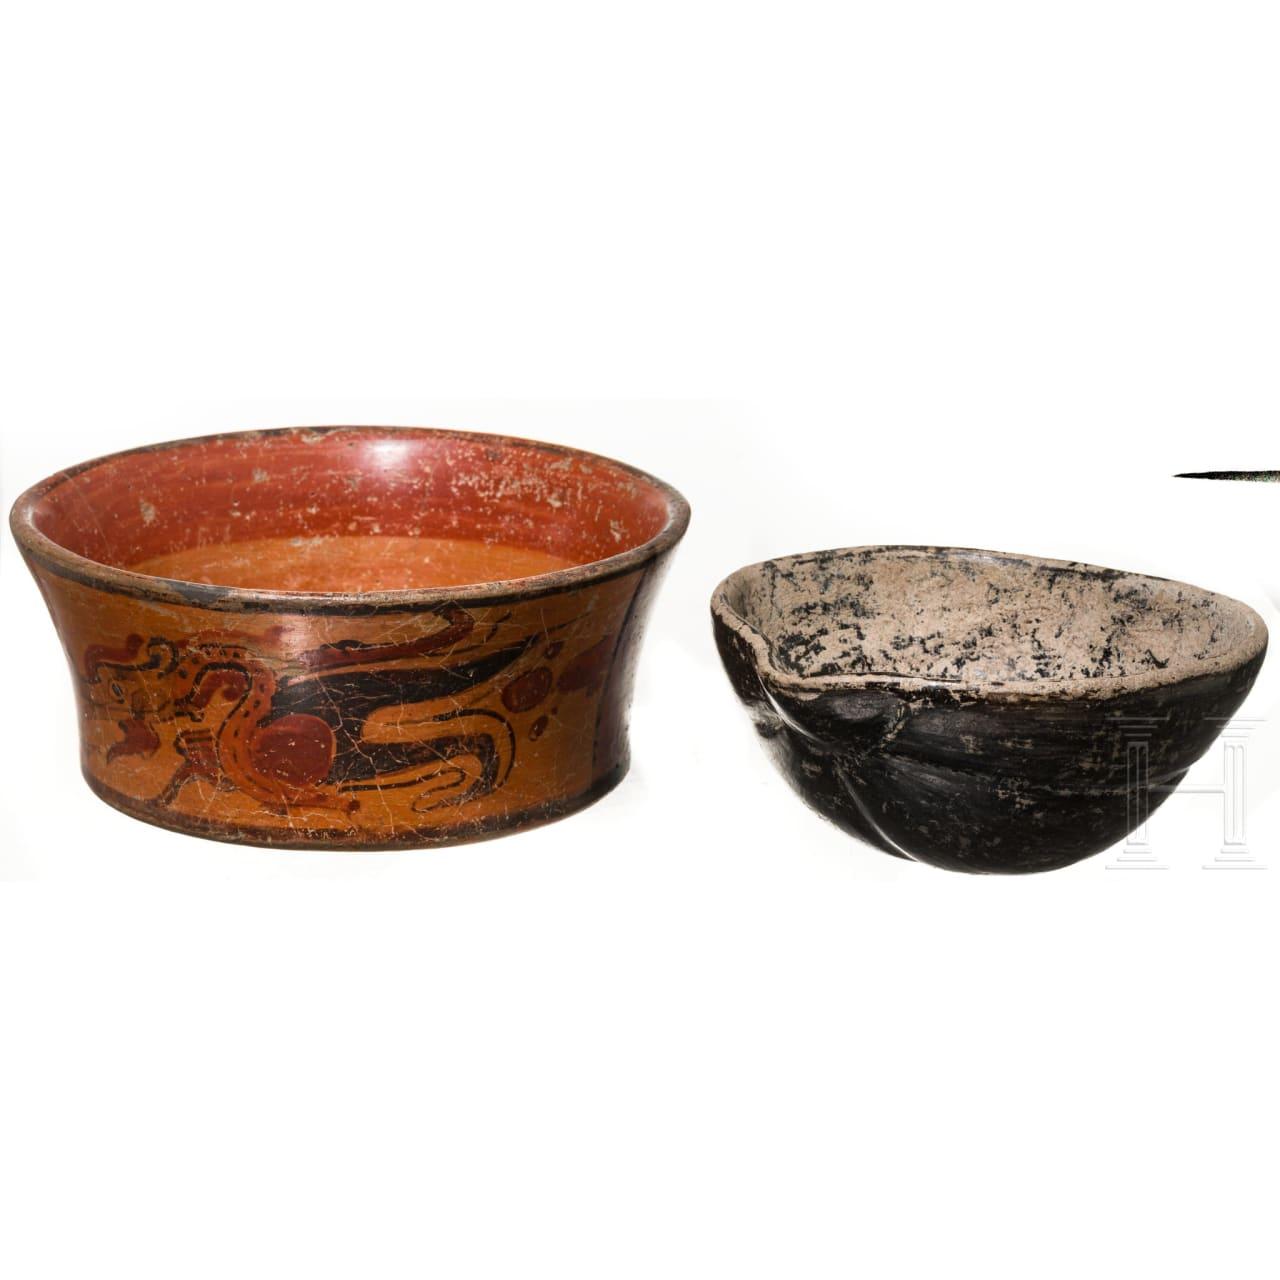 Two Maya bowls, Guatemala, late classical period, 600 - 900 A.D.